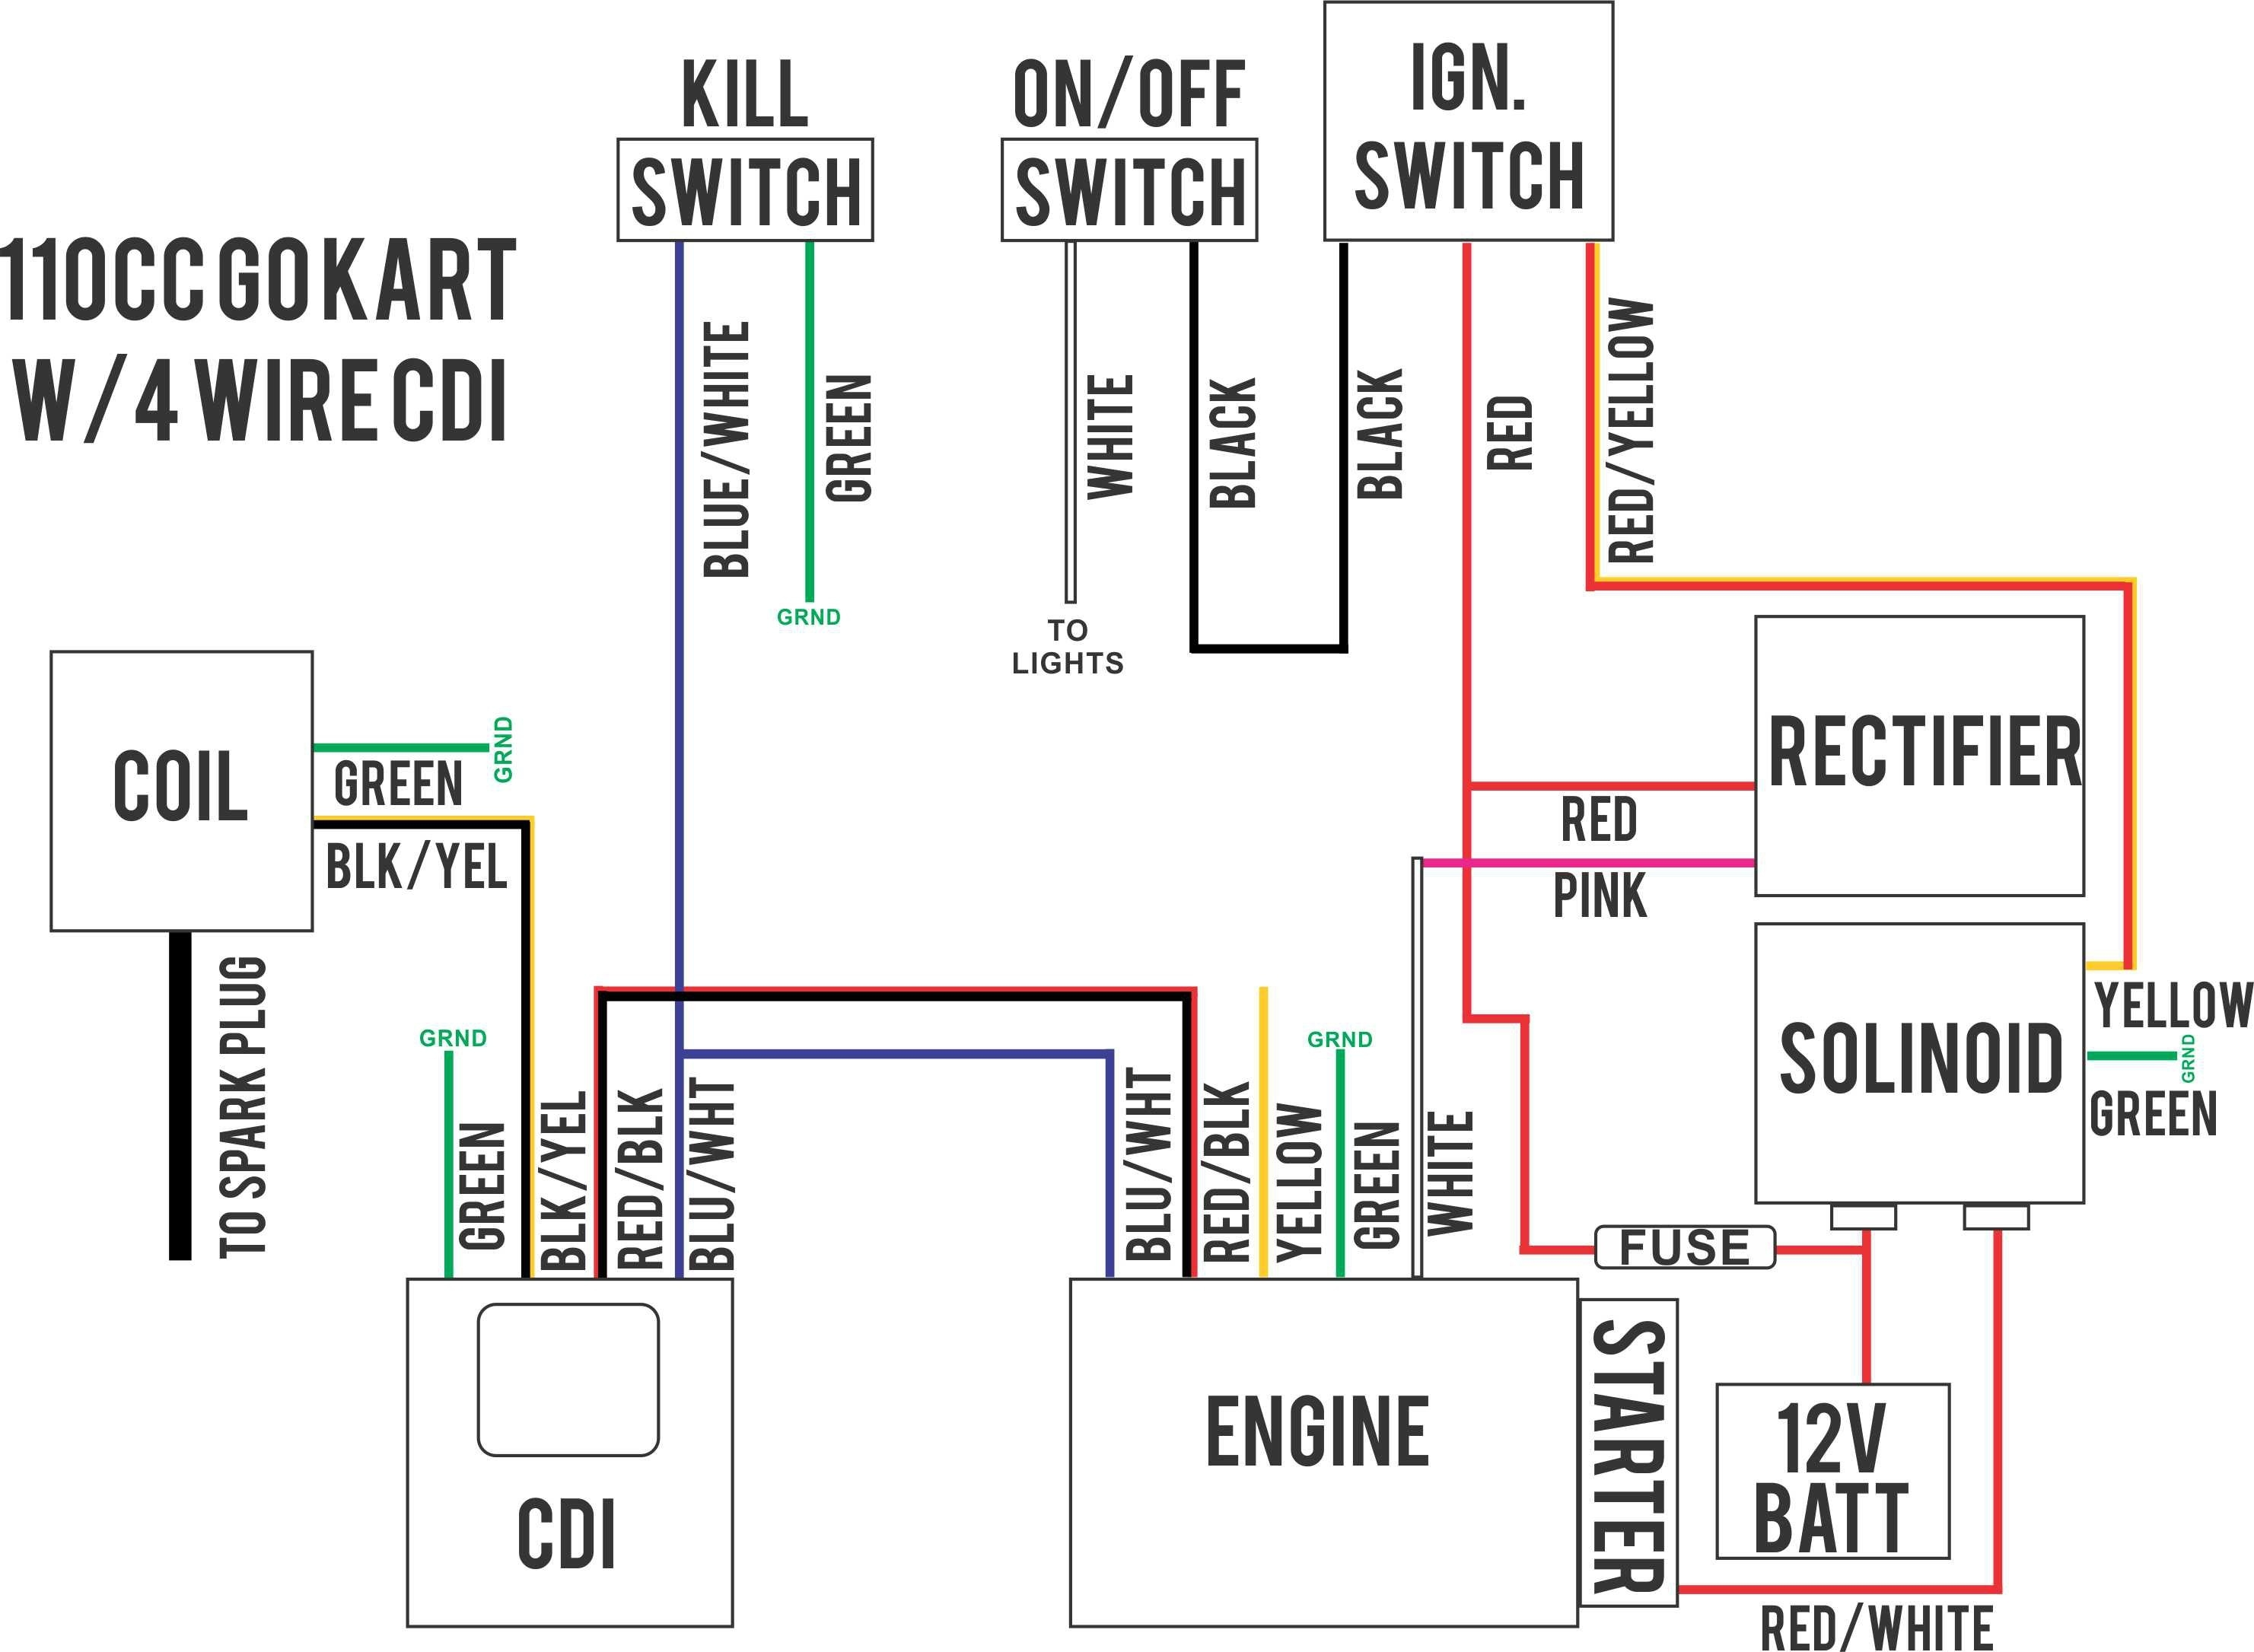 evo 300 wiring diagram wiring diagram megaevo 300 wiring diagram wiring diagram post evo 300 wiring diagram